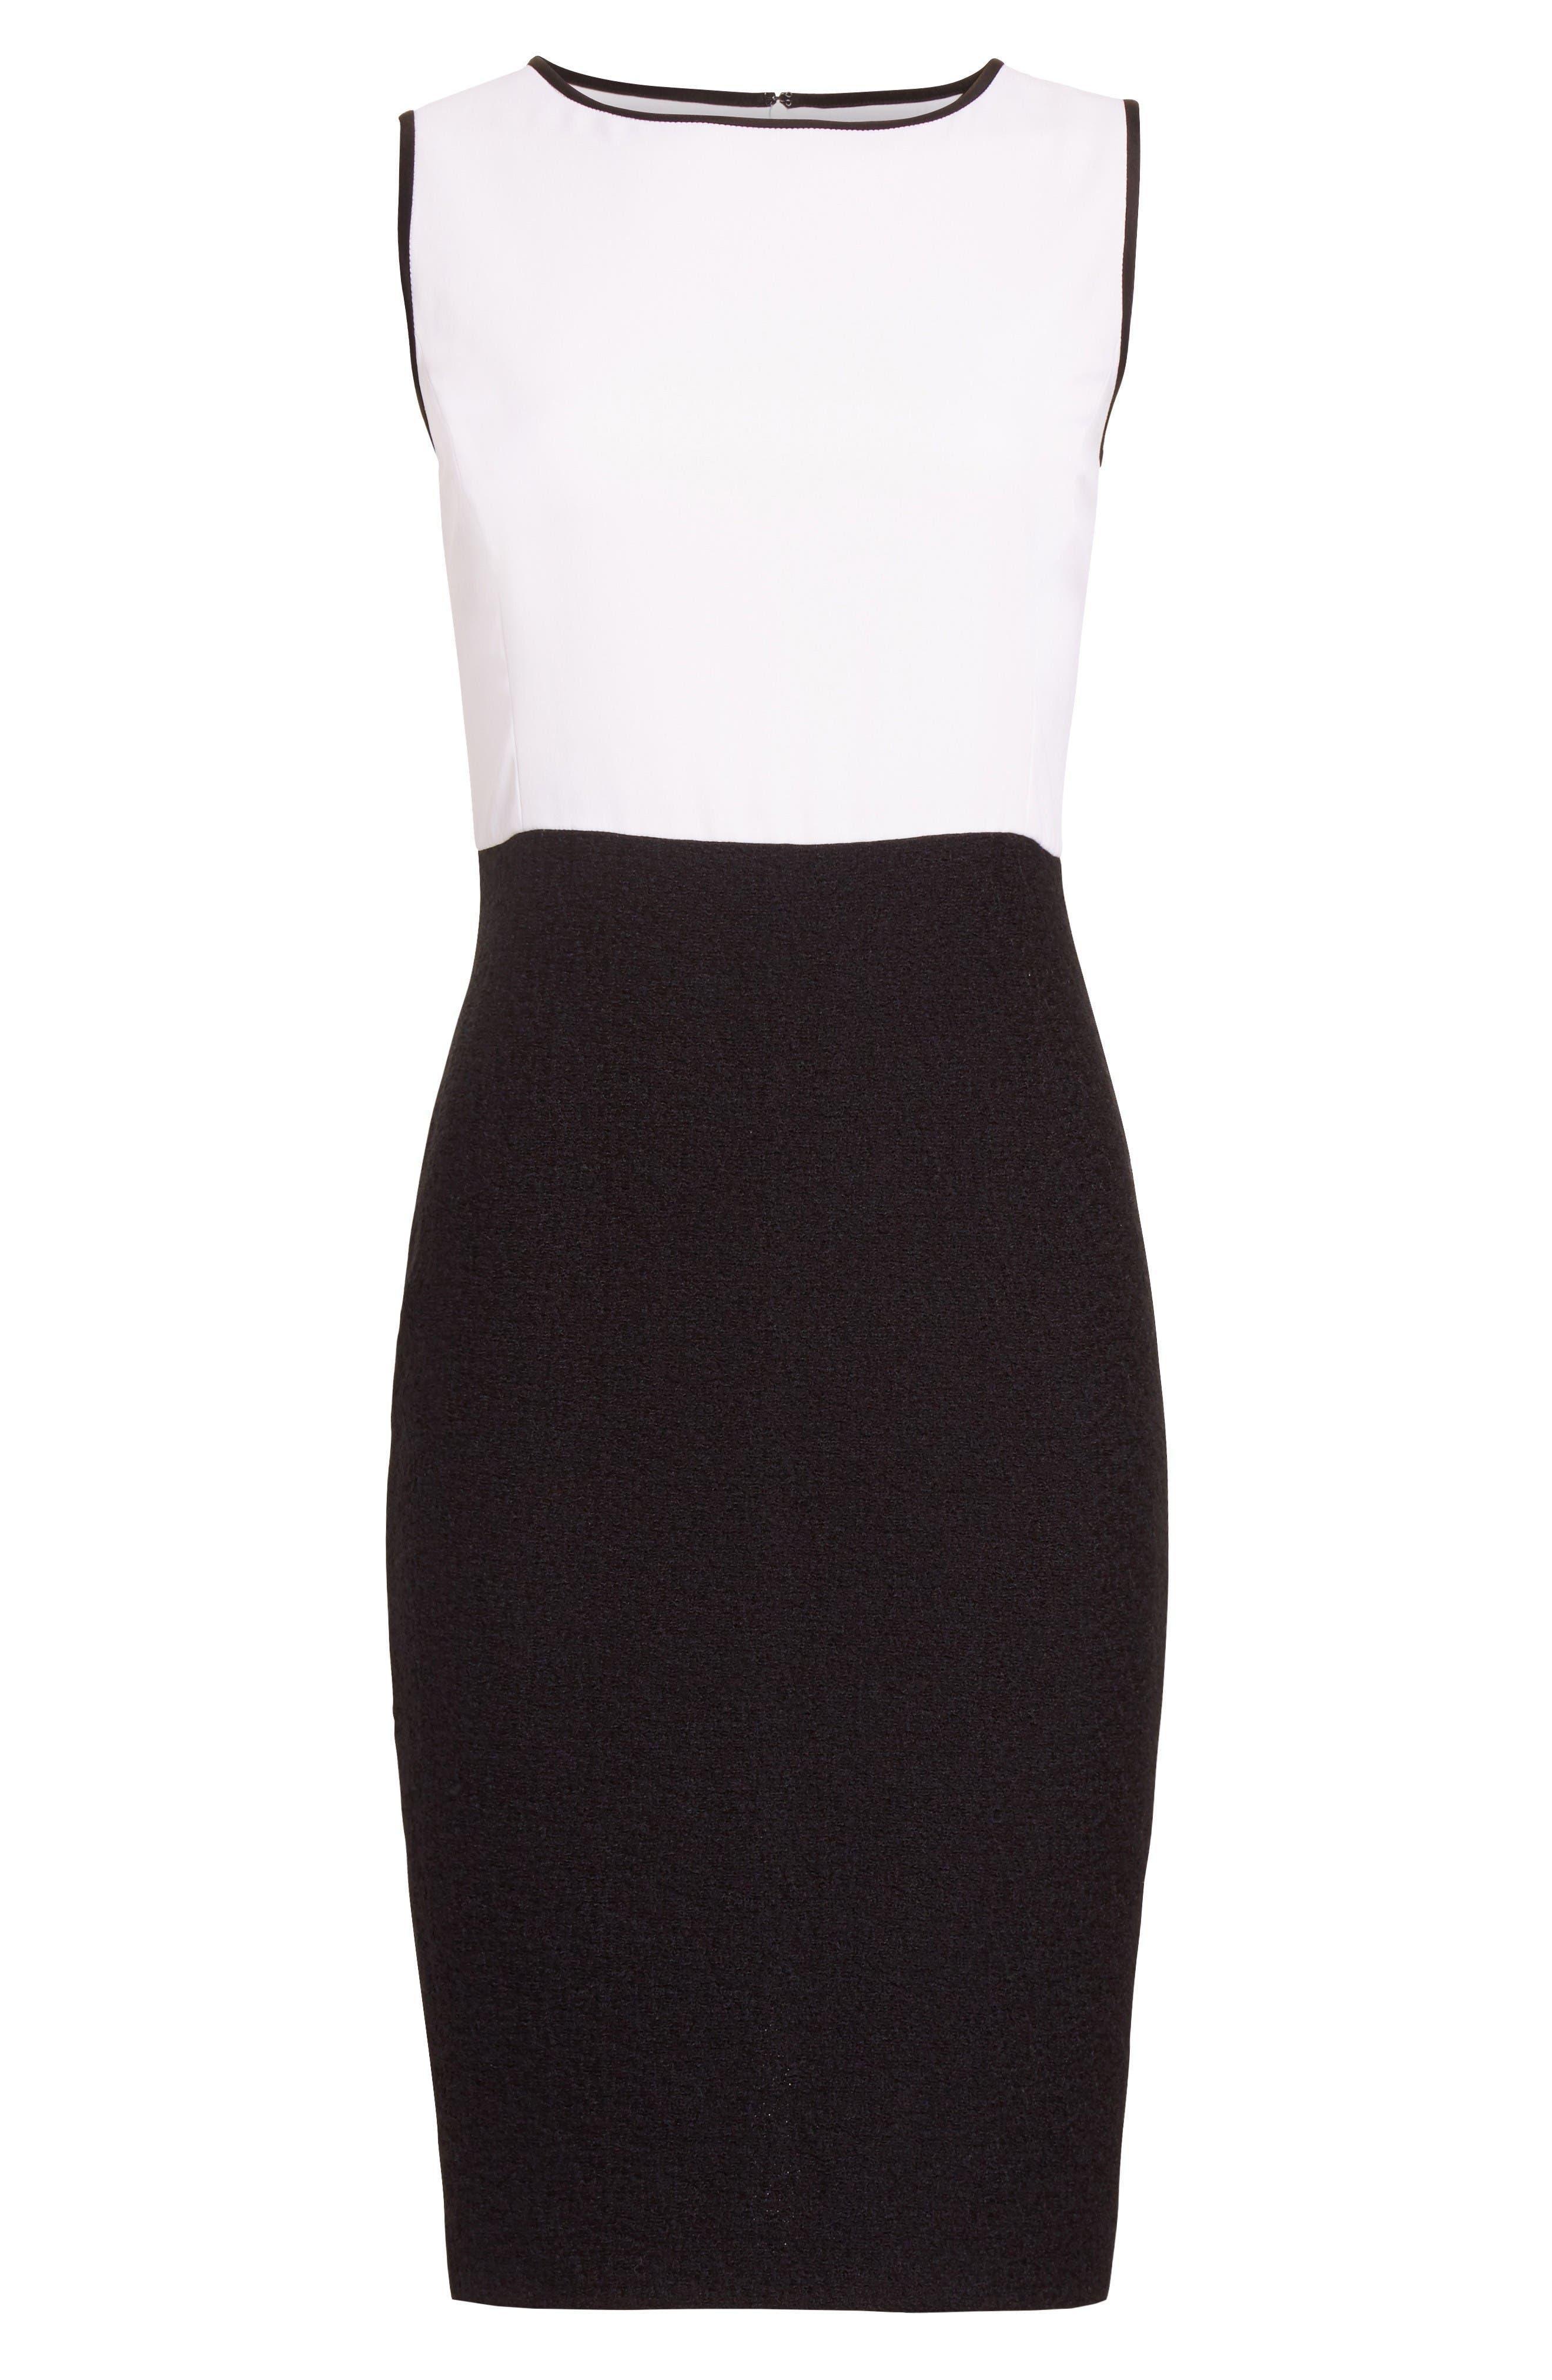 Cady Bodice Clair Knit Dress,                             Alternate thumbnail 7, color,                             Bianco/ Caviar